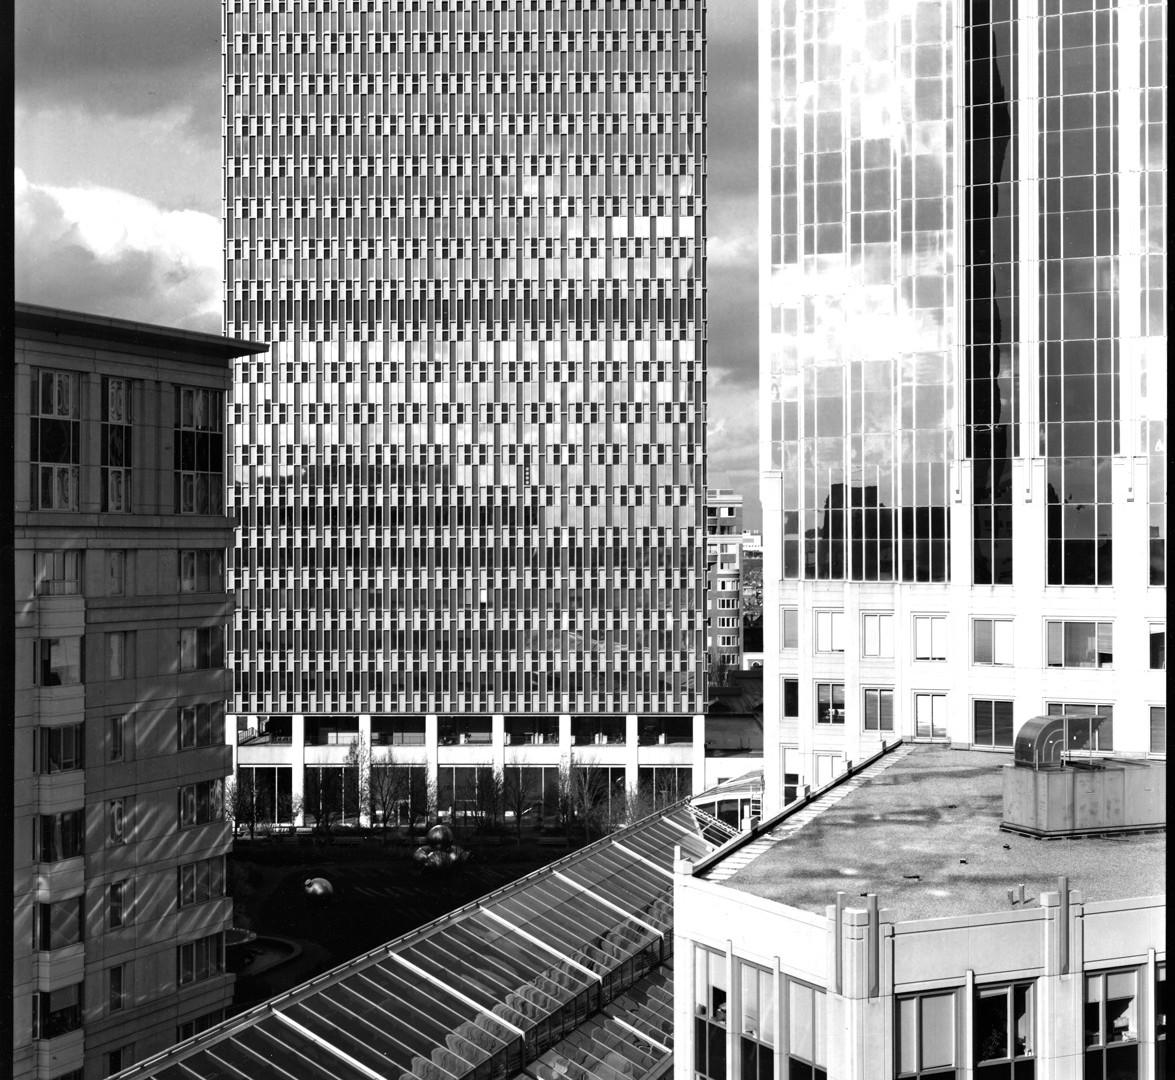 Nicholas Nixon, View of Prudential Building, Boston, 2008